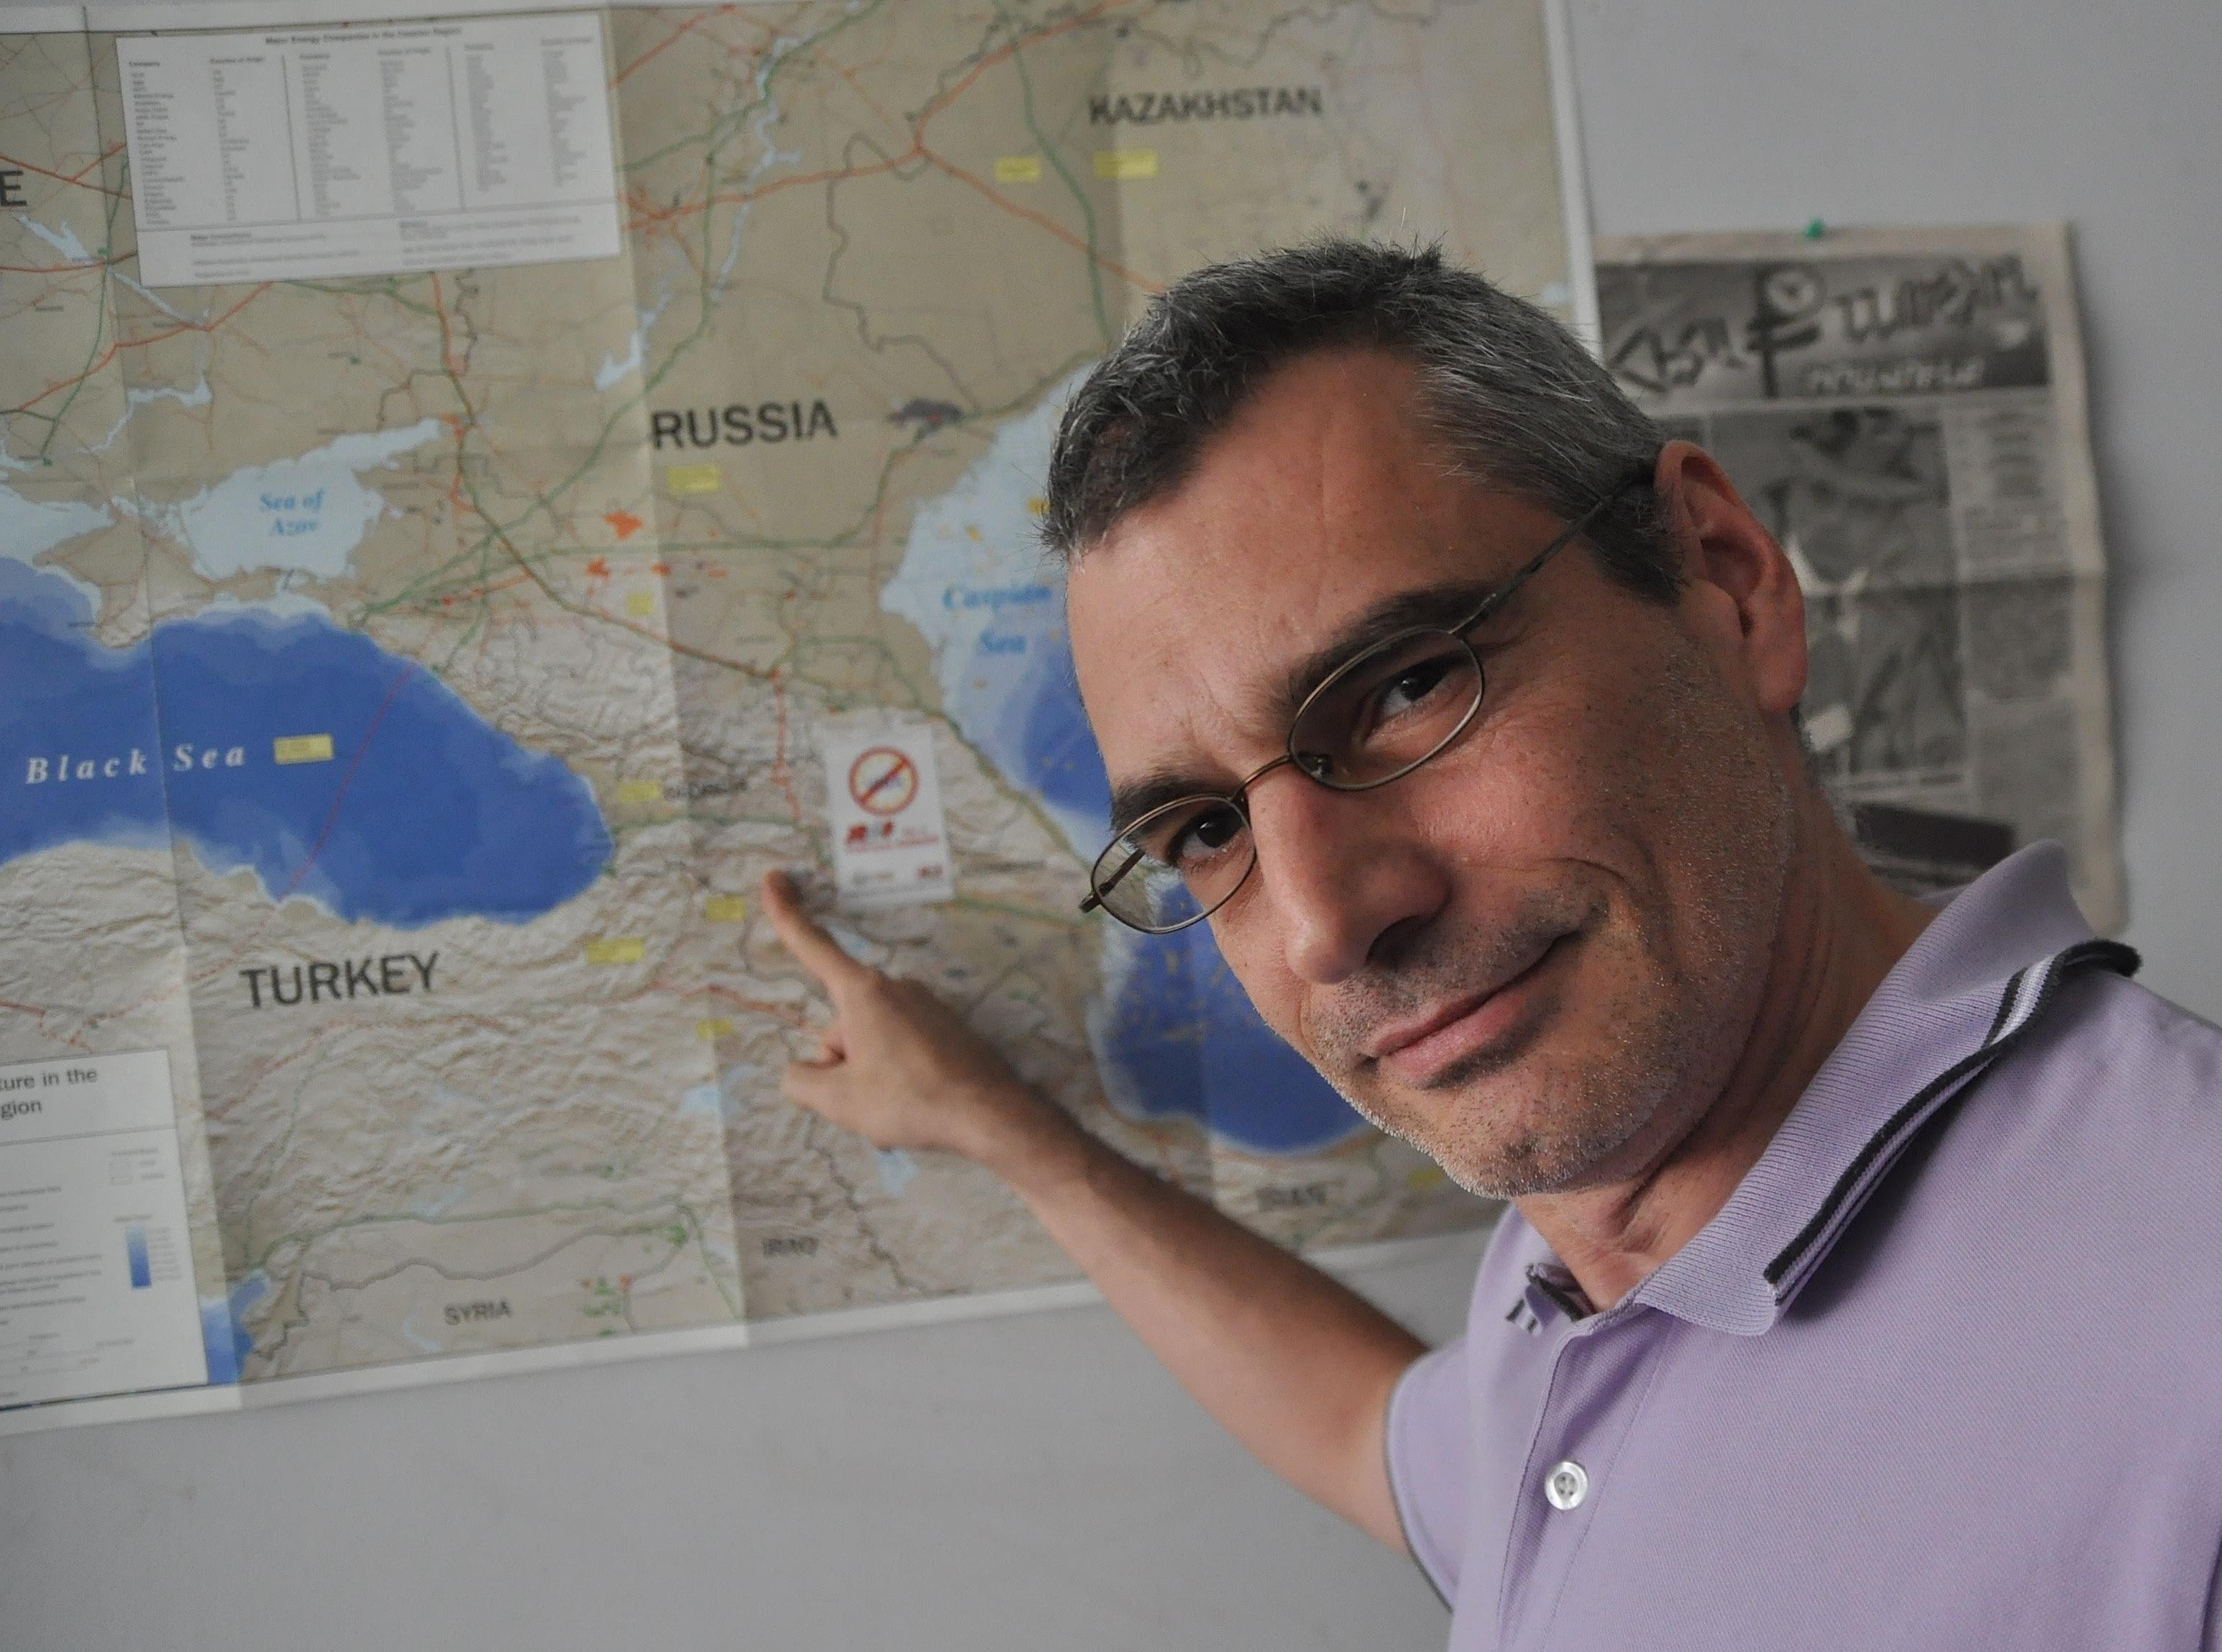 http://eurocaucasusnews.files.wordpress.com/2011/10/r-g_0011.jpg